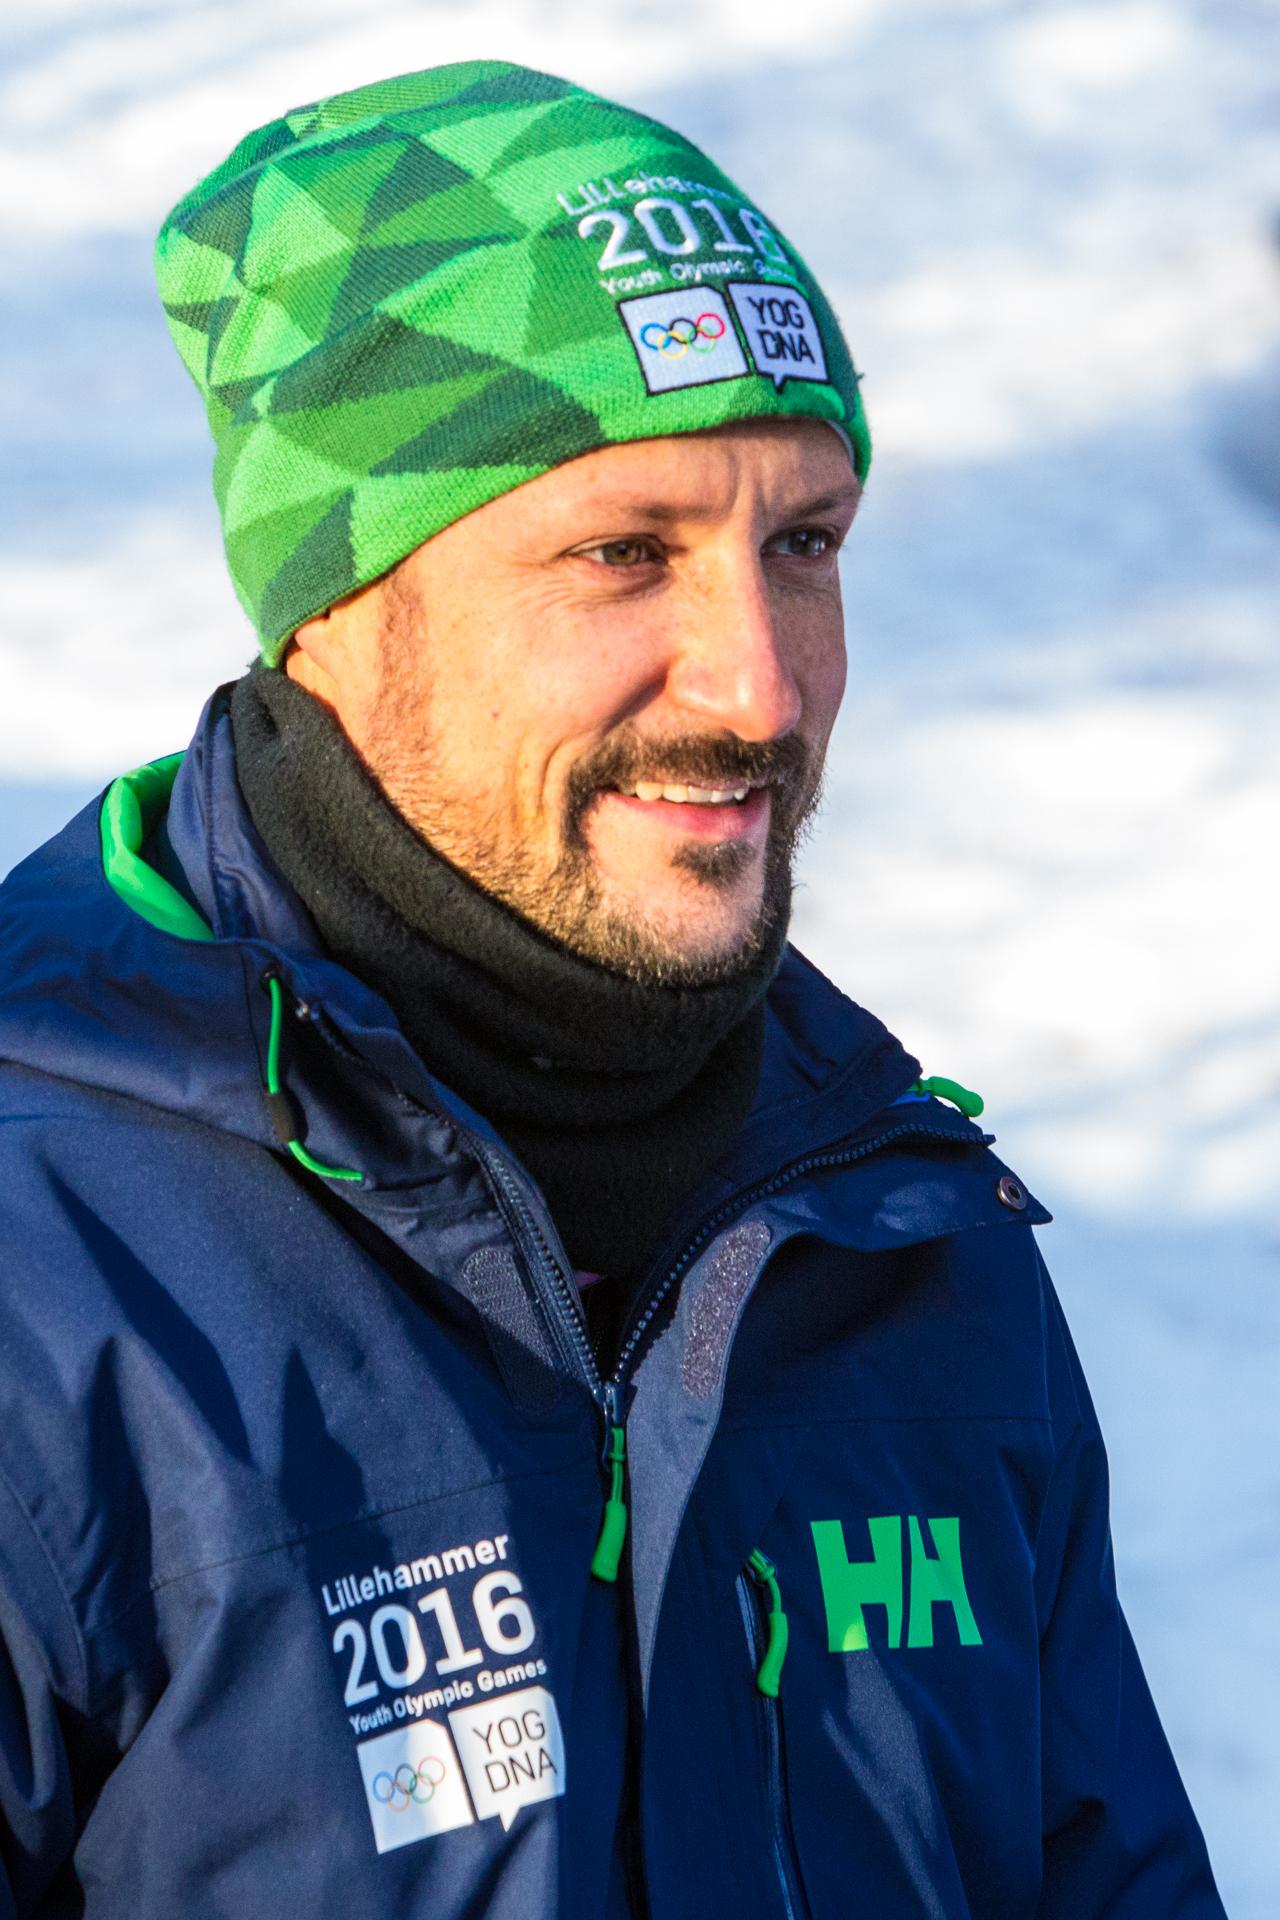 Lillehammer 2016 - Caroline Strømhylden5.jpg